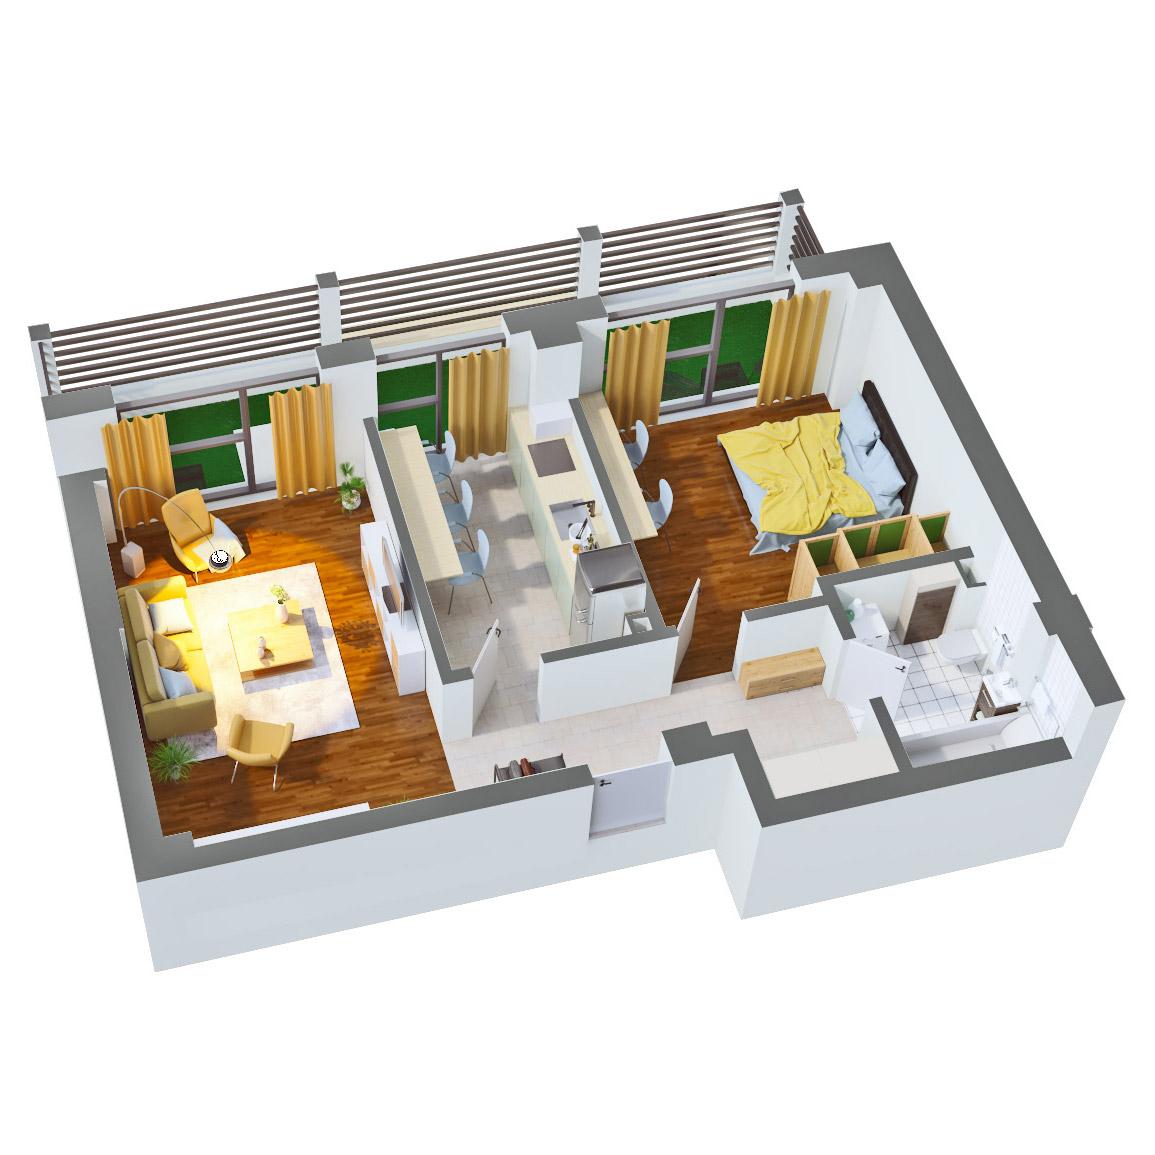 Apartament 2 camere de vanzare Bucuresti - Catedral Residence - Marriott, Piata Unirii, 13 Septembrie, Izvor - Tip 5 - T2A - C